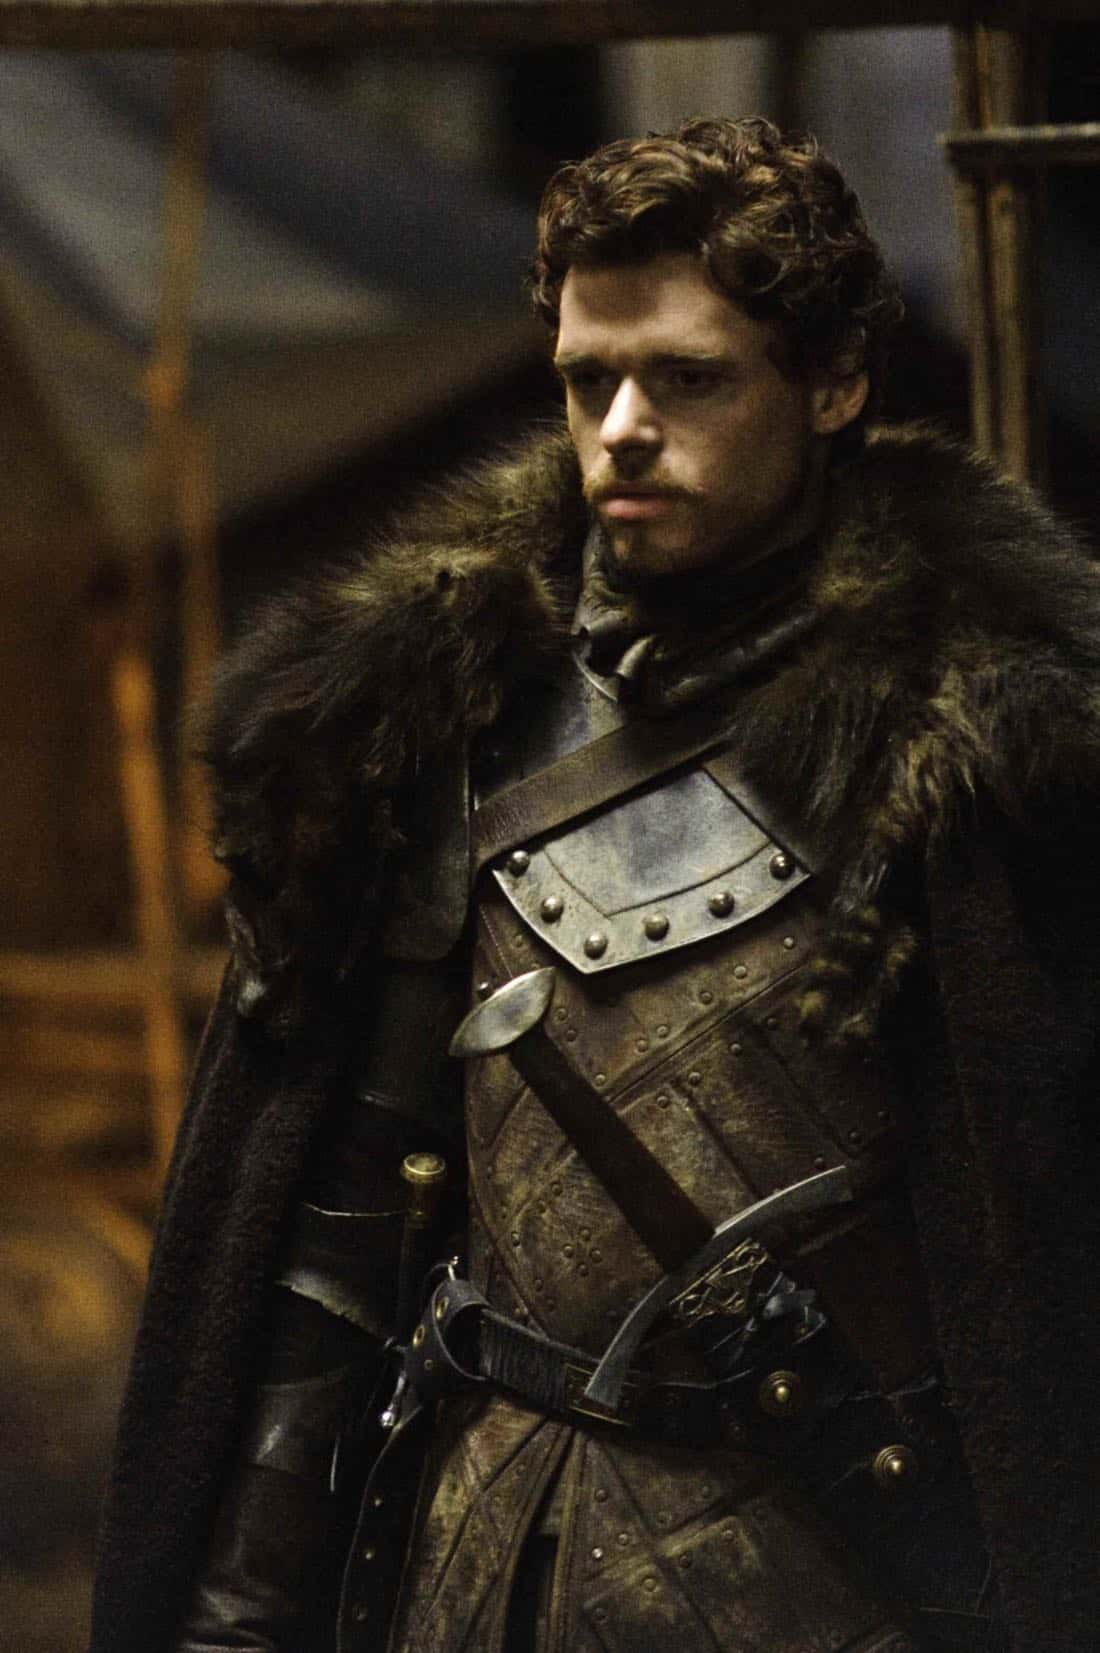 Game Of Thrones Episode 1 Season 2 14